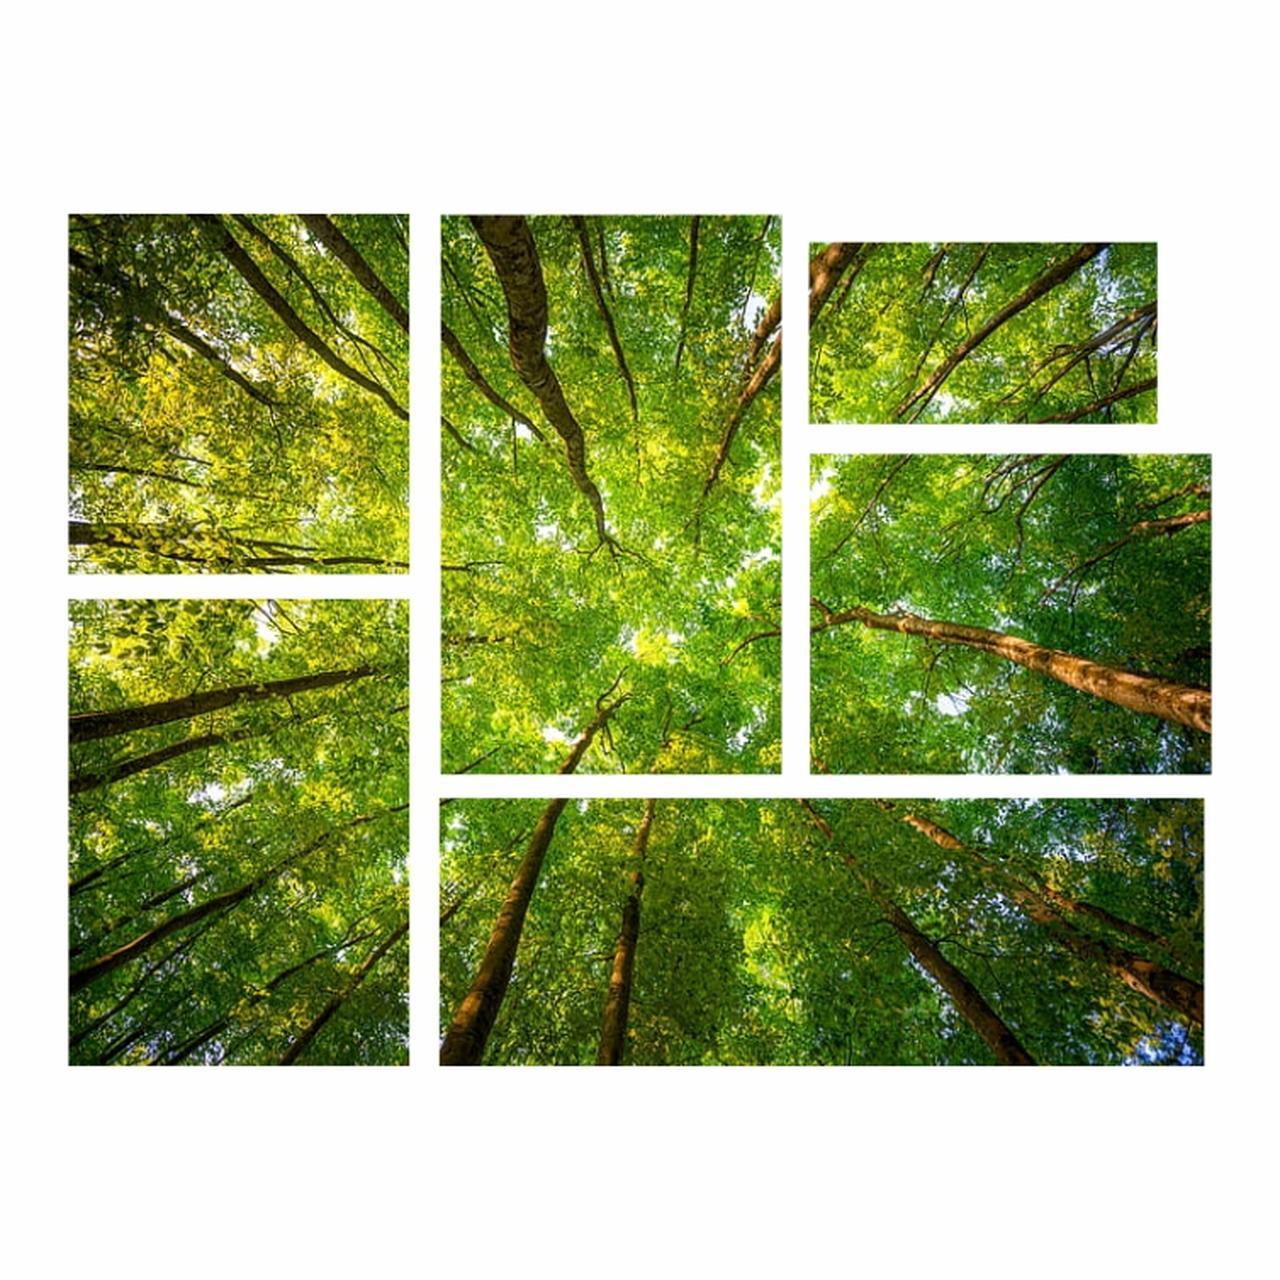 Kit de Quadros Árvores Luxo  - Kit 6 telas